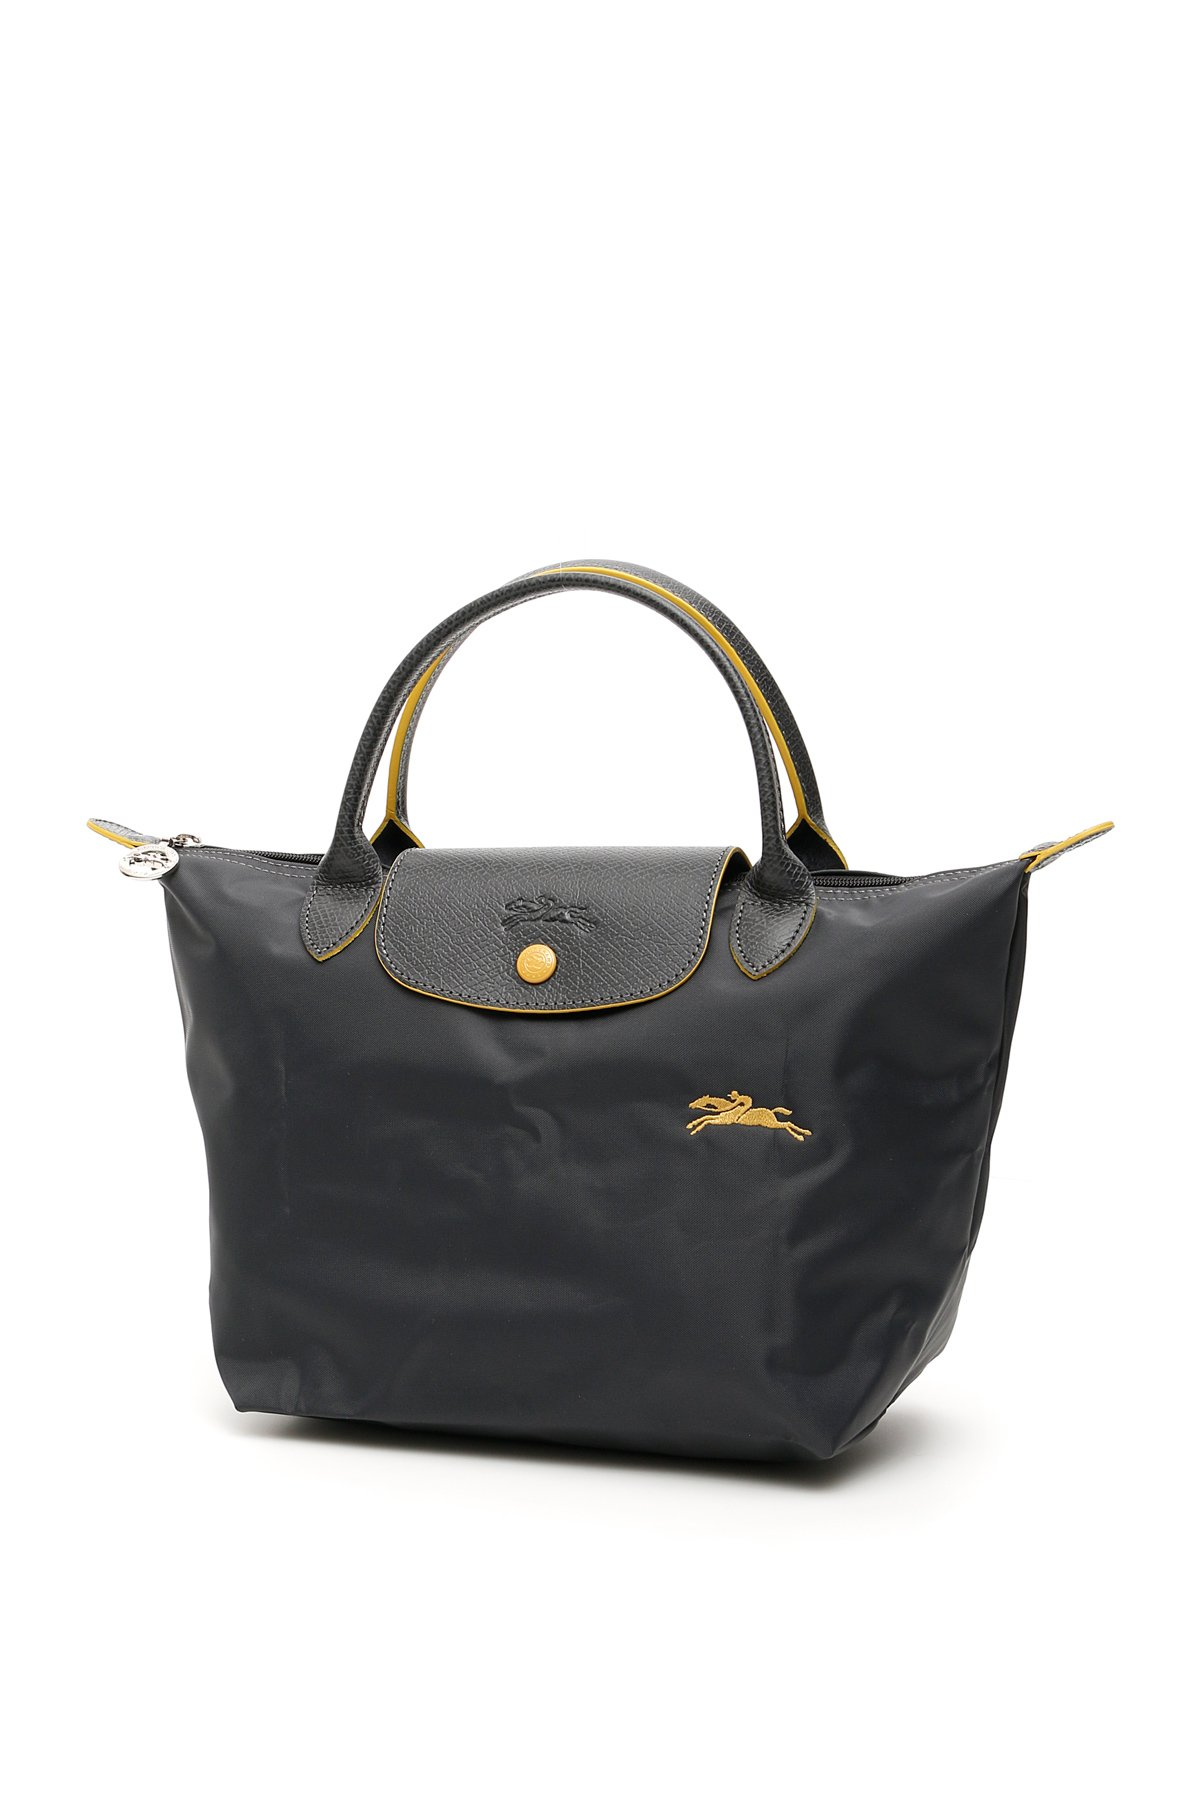 Longchamp shopping le pliage club small